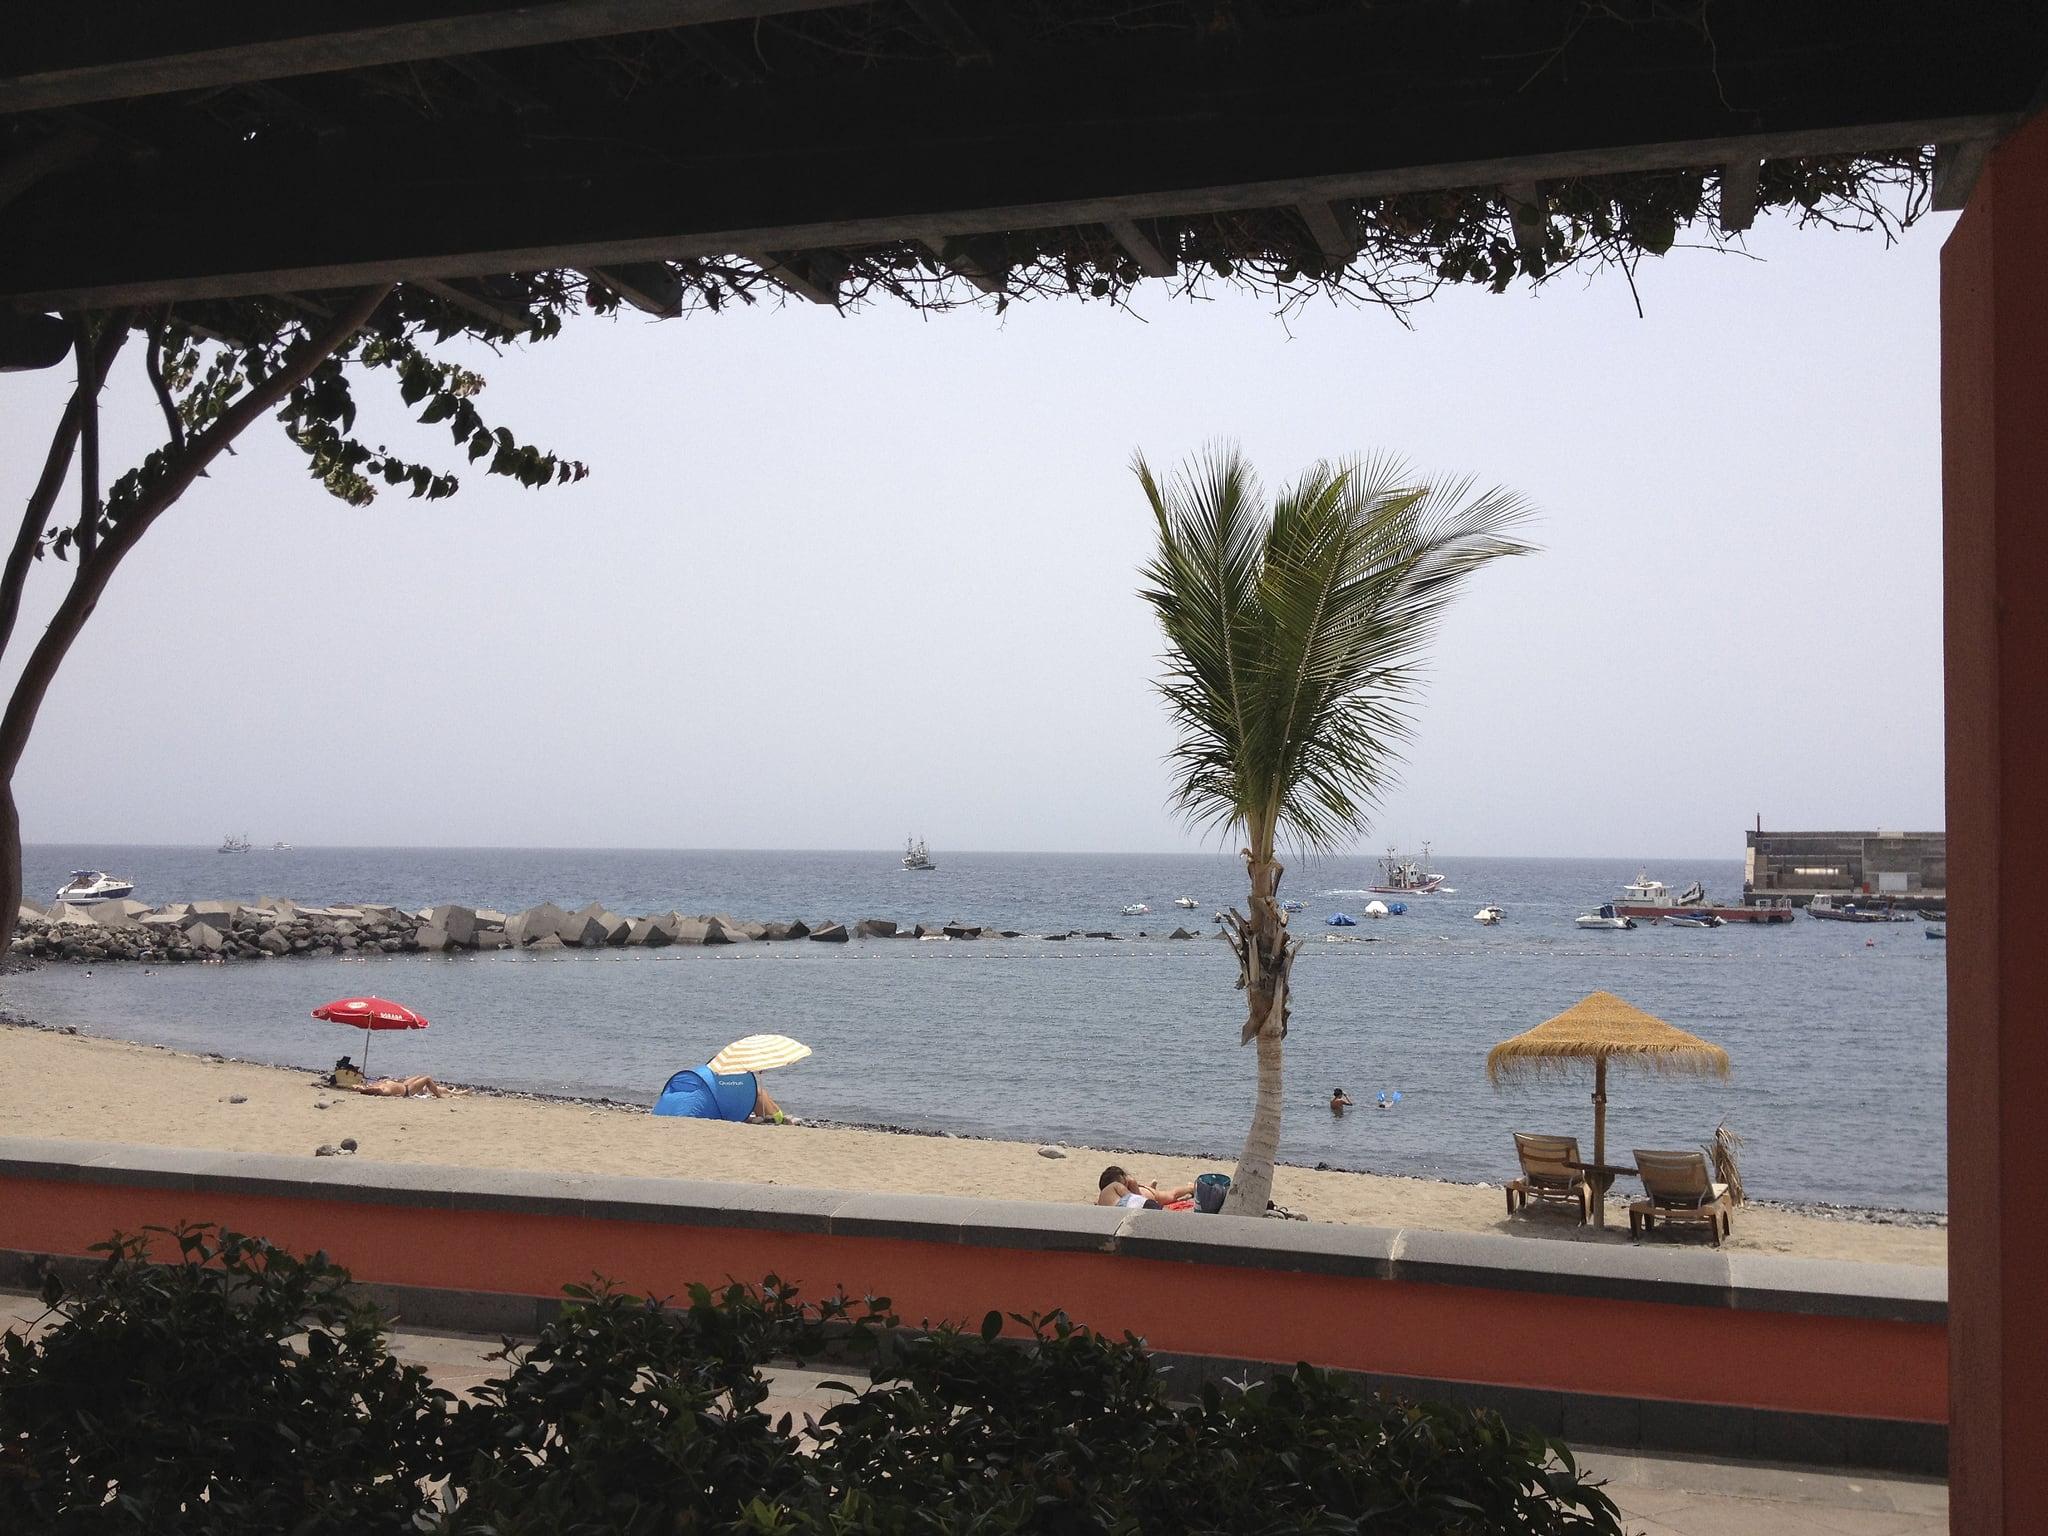 Playa de San Juan görüntü. lifeblog espagne ilescanaries guíadeisora lifeblog4